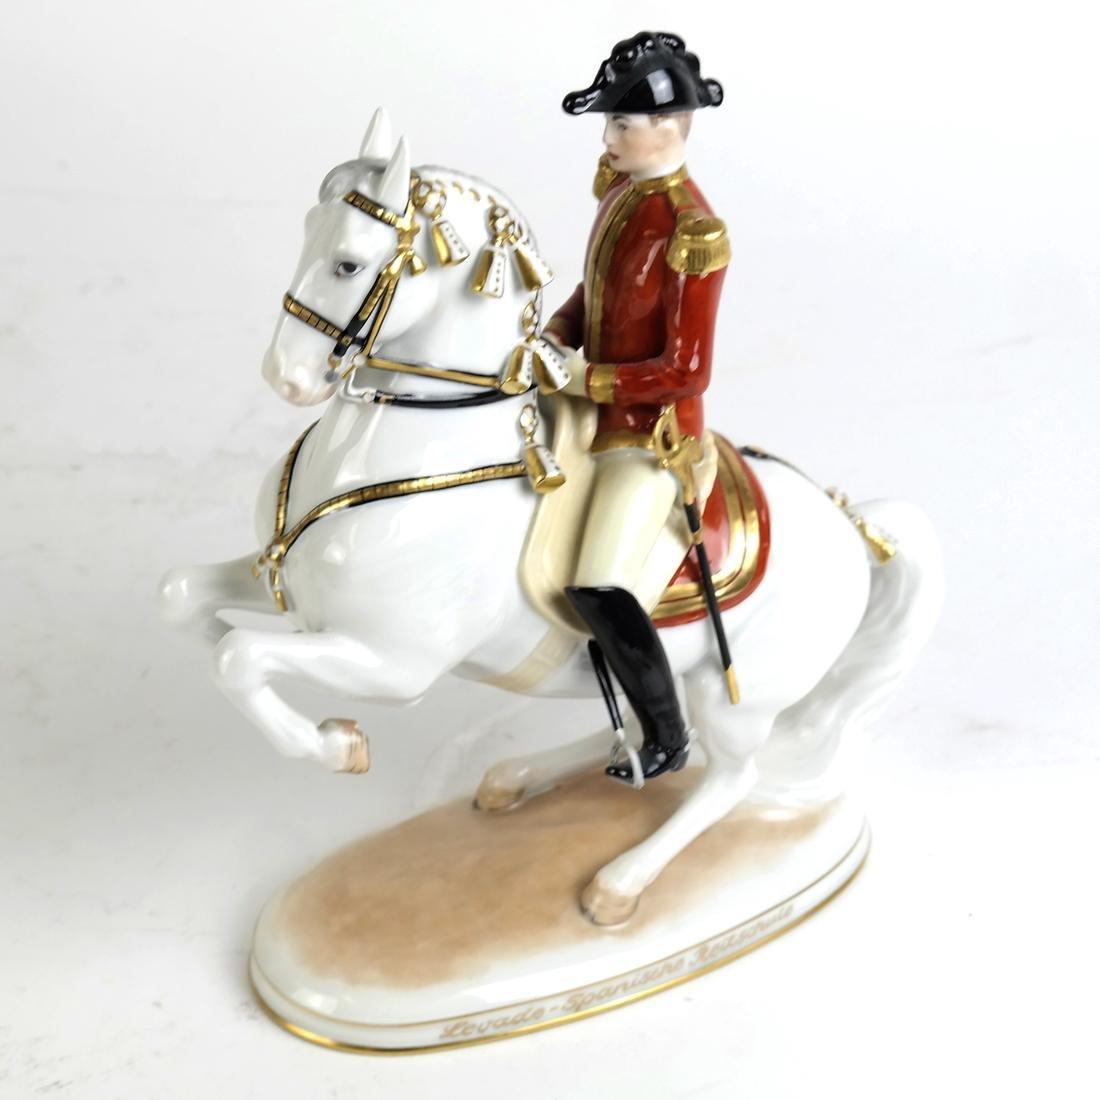 Austrian Vienna Ceramic Horse and Rider